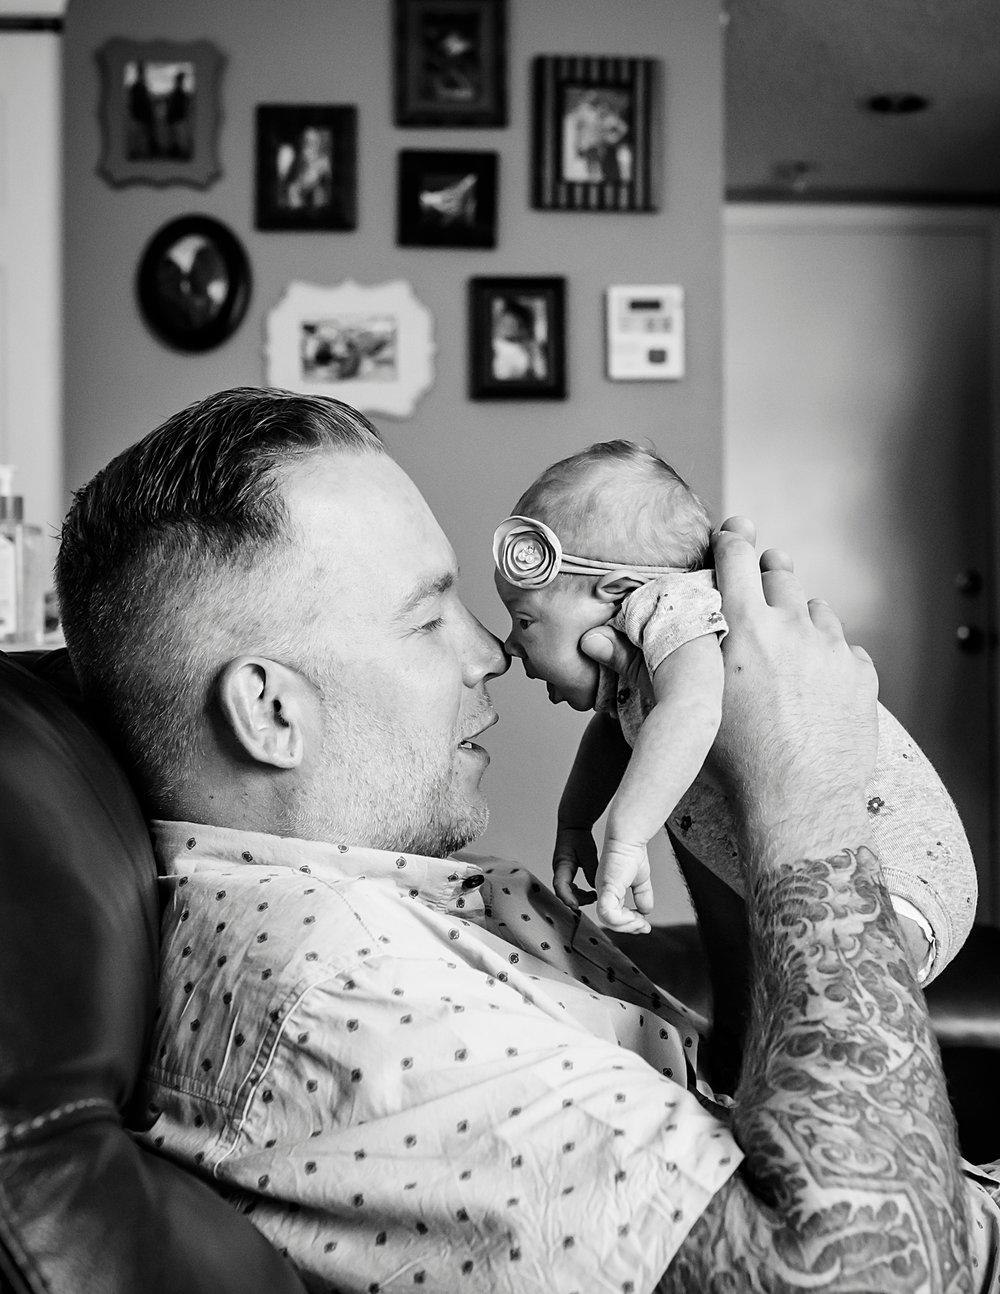 denver-newborn-photographer-dad-daughter.jpg